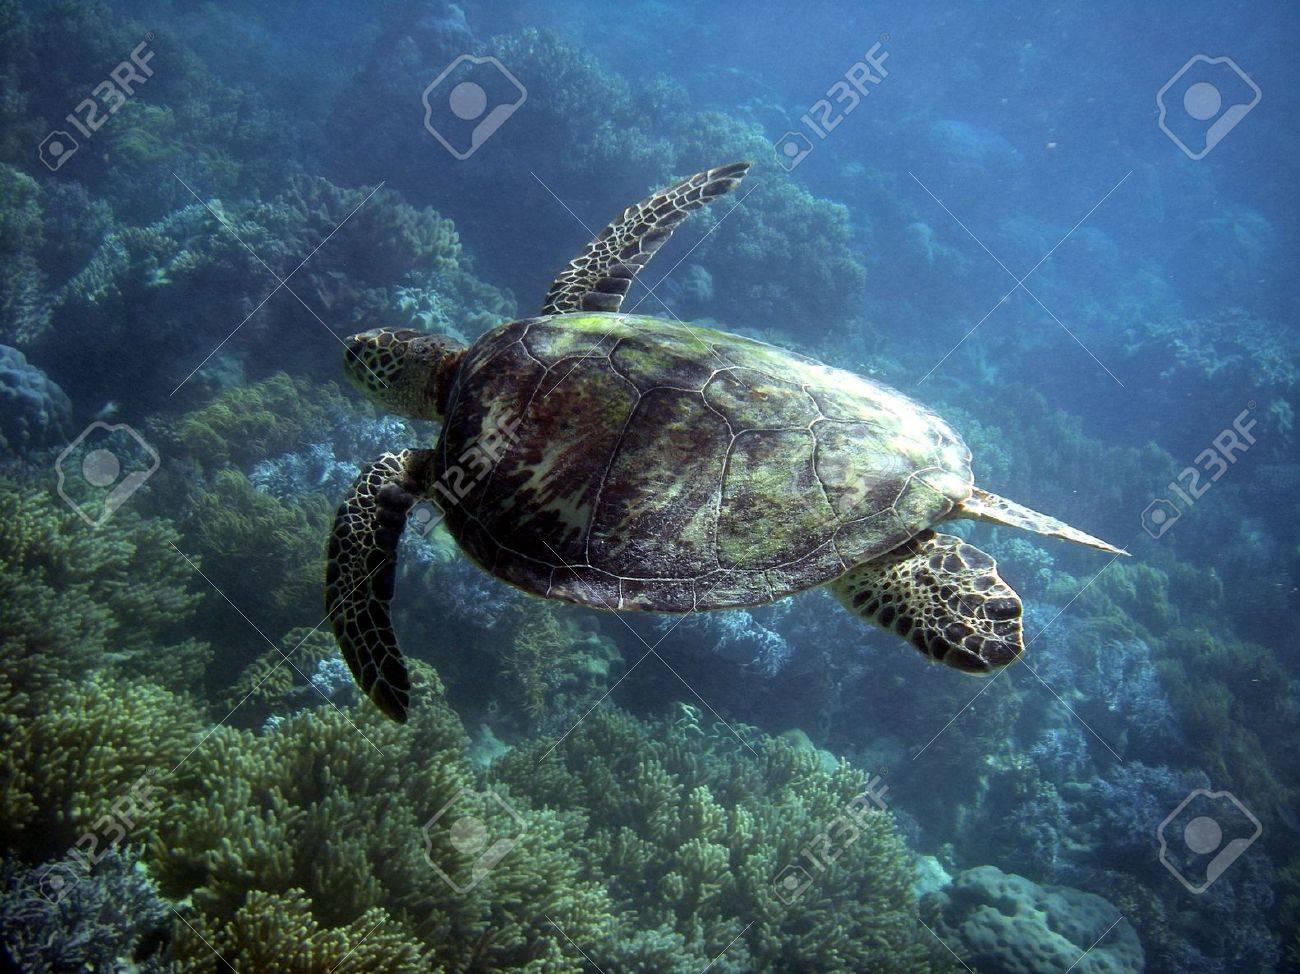 Sea Turtle in Great Barrier Reef - Australia Stock Photo - 4959157